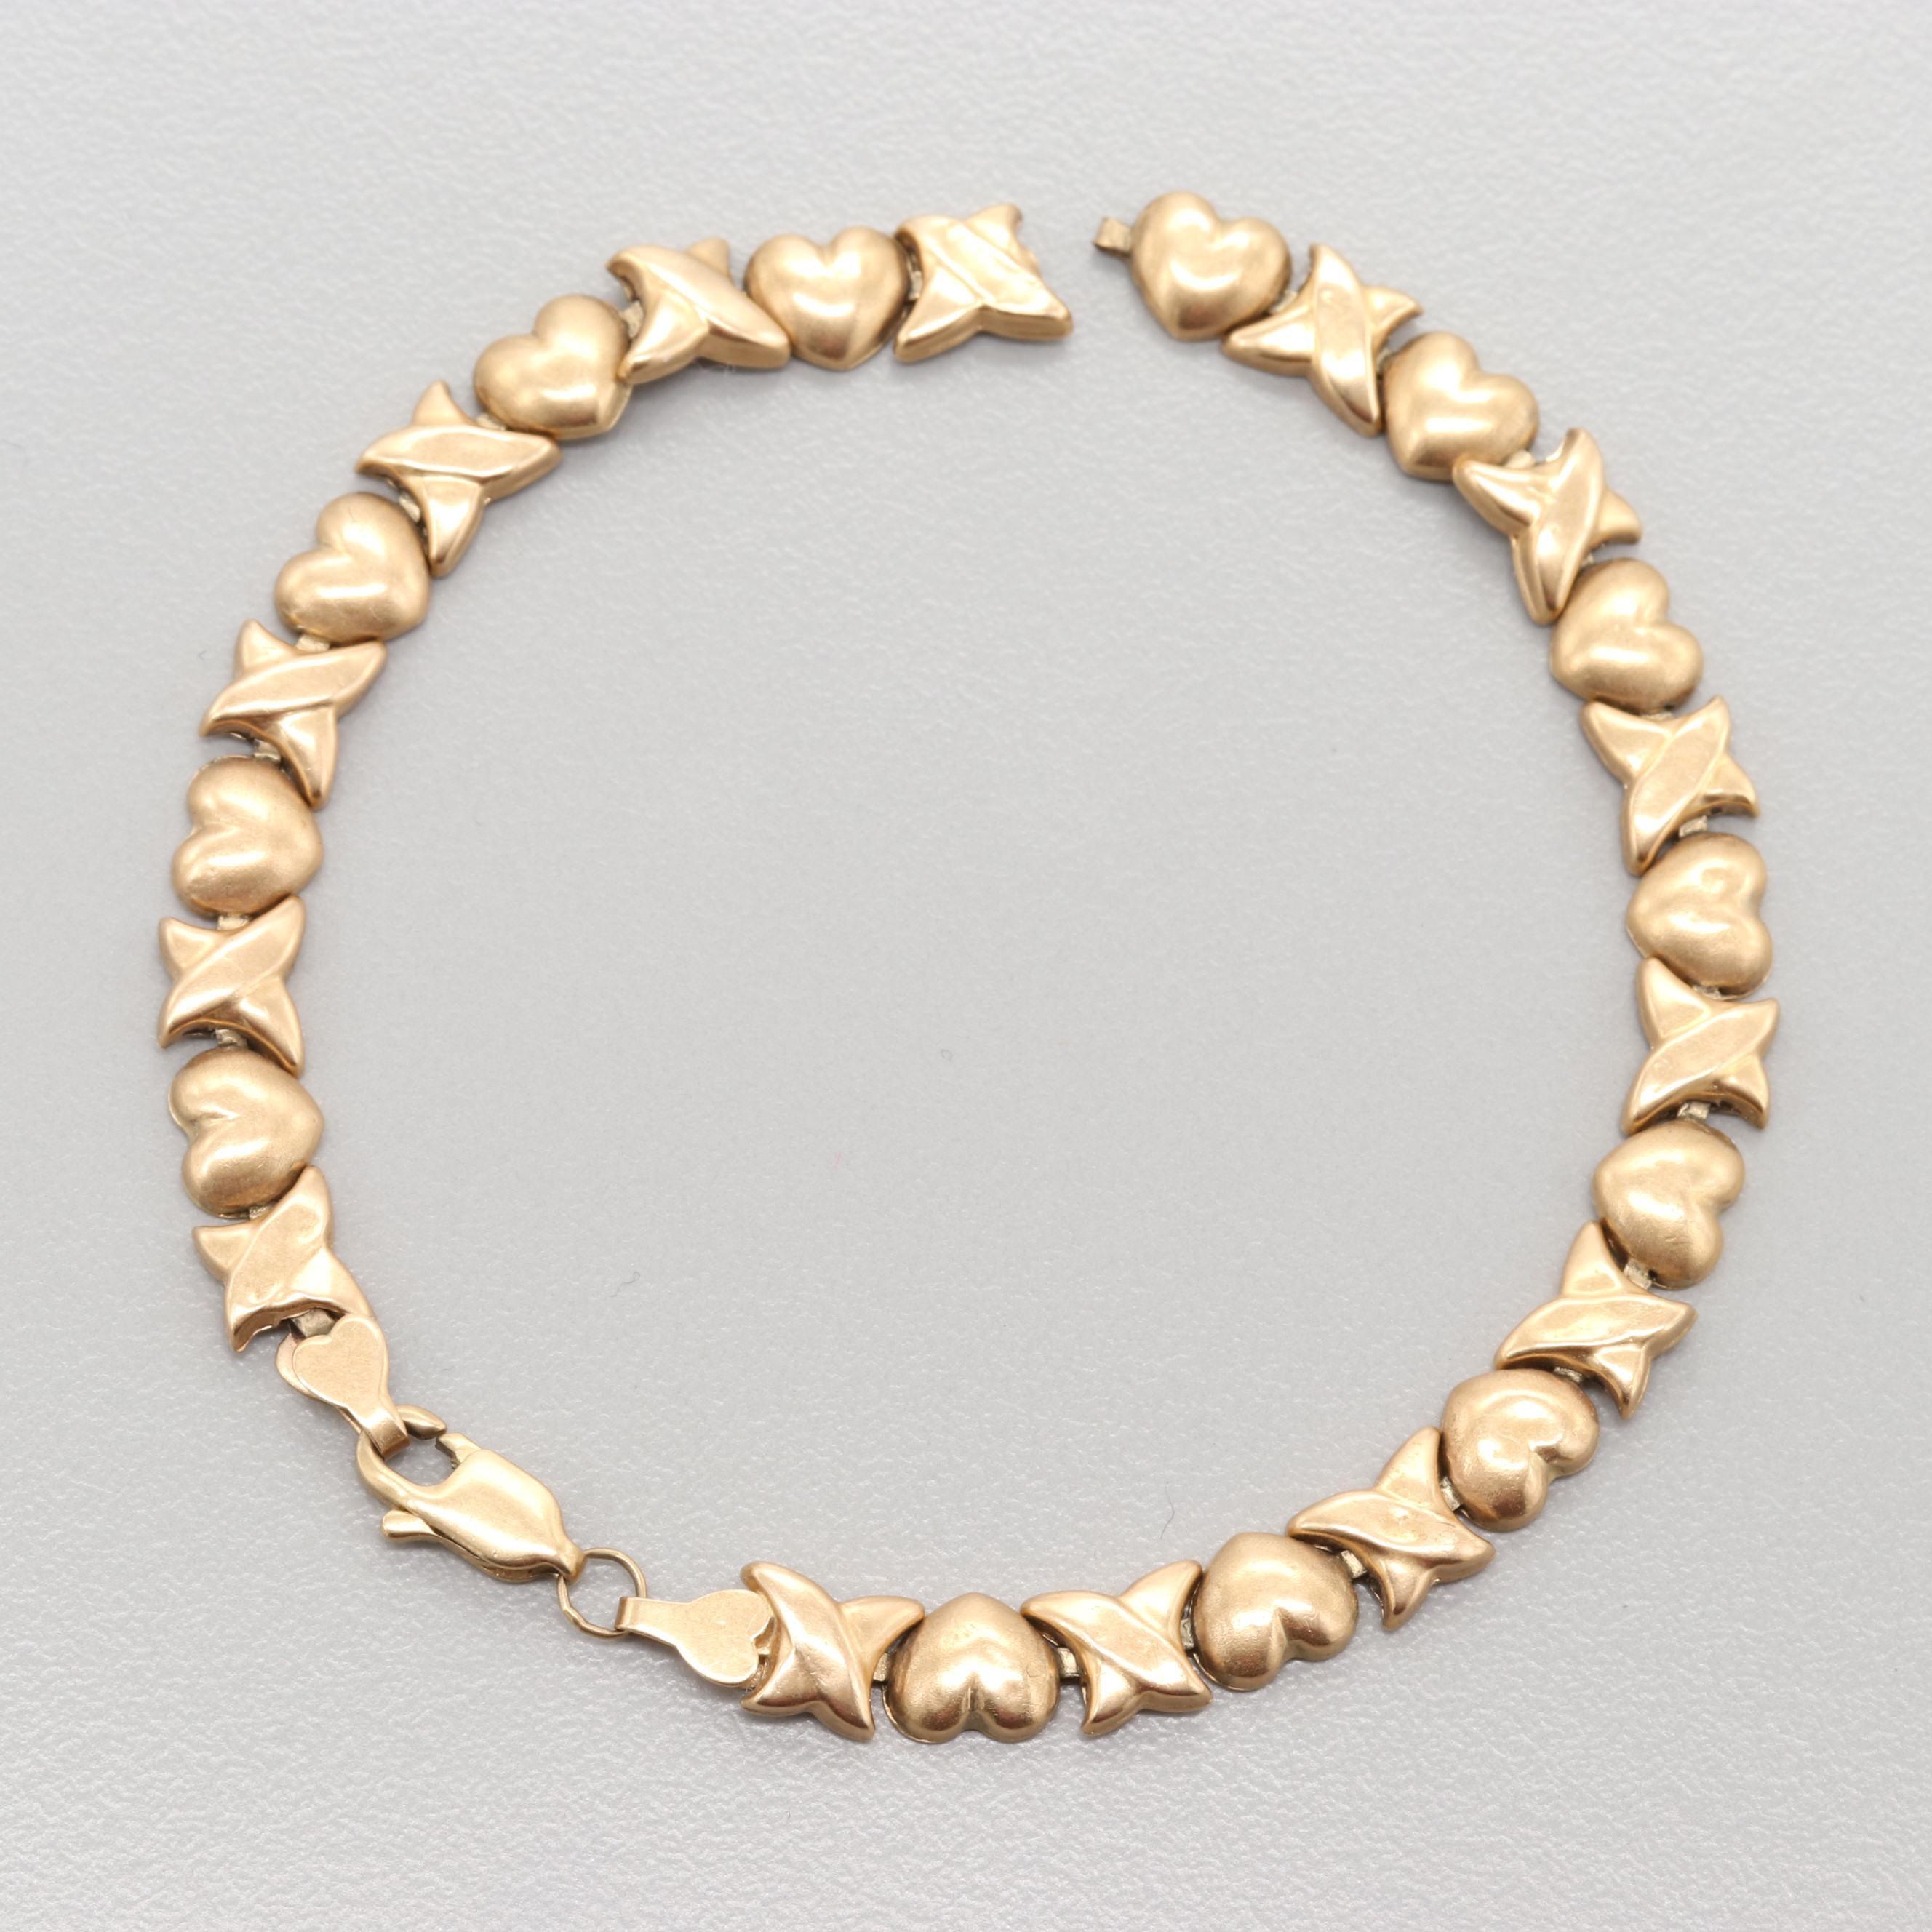 10K Yellow Gold Heart Motif Link Bracelet